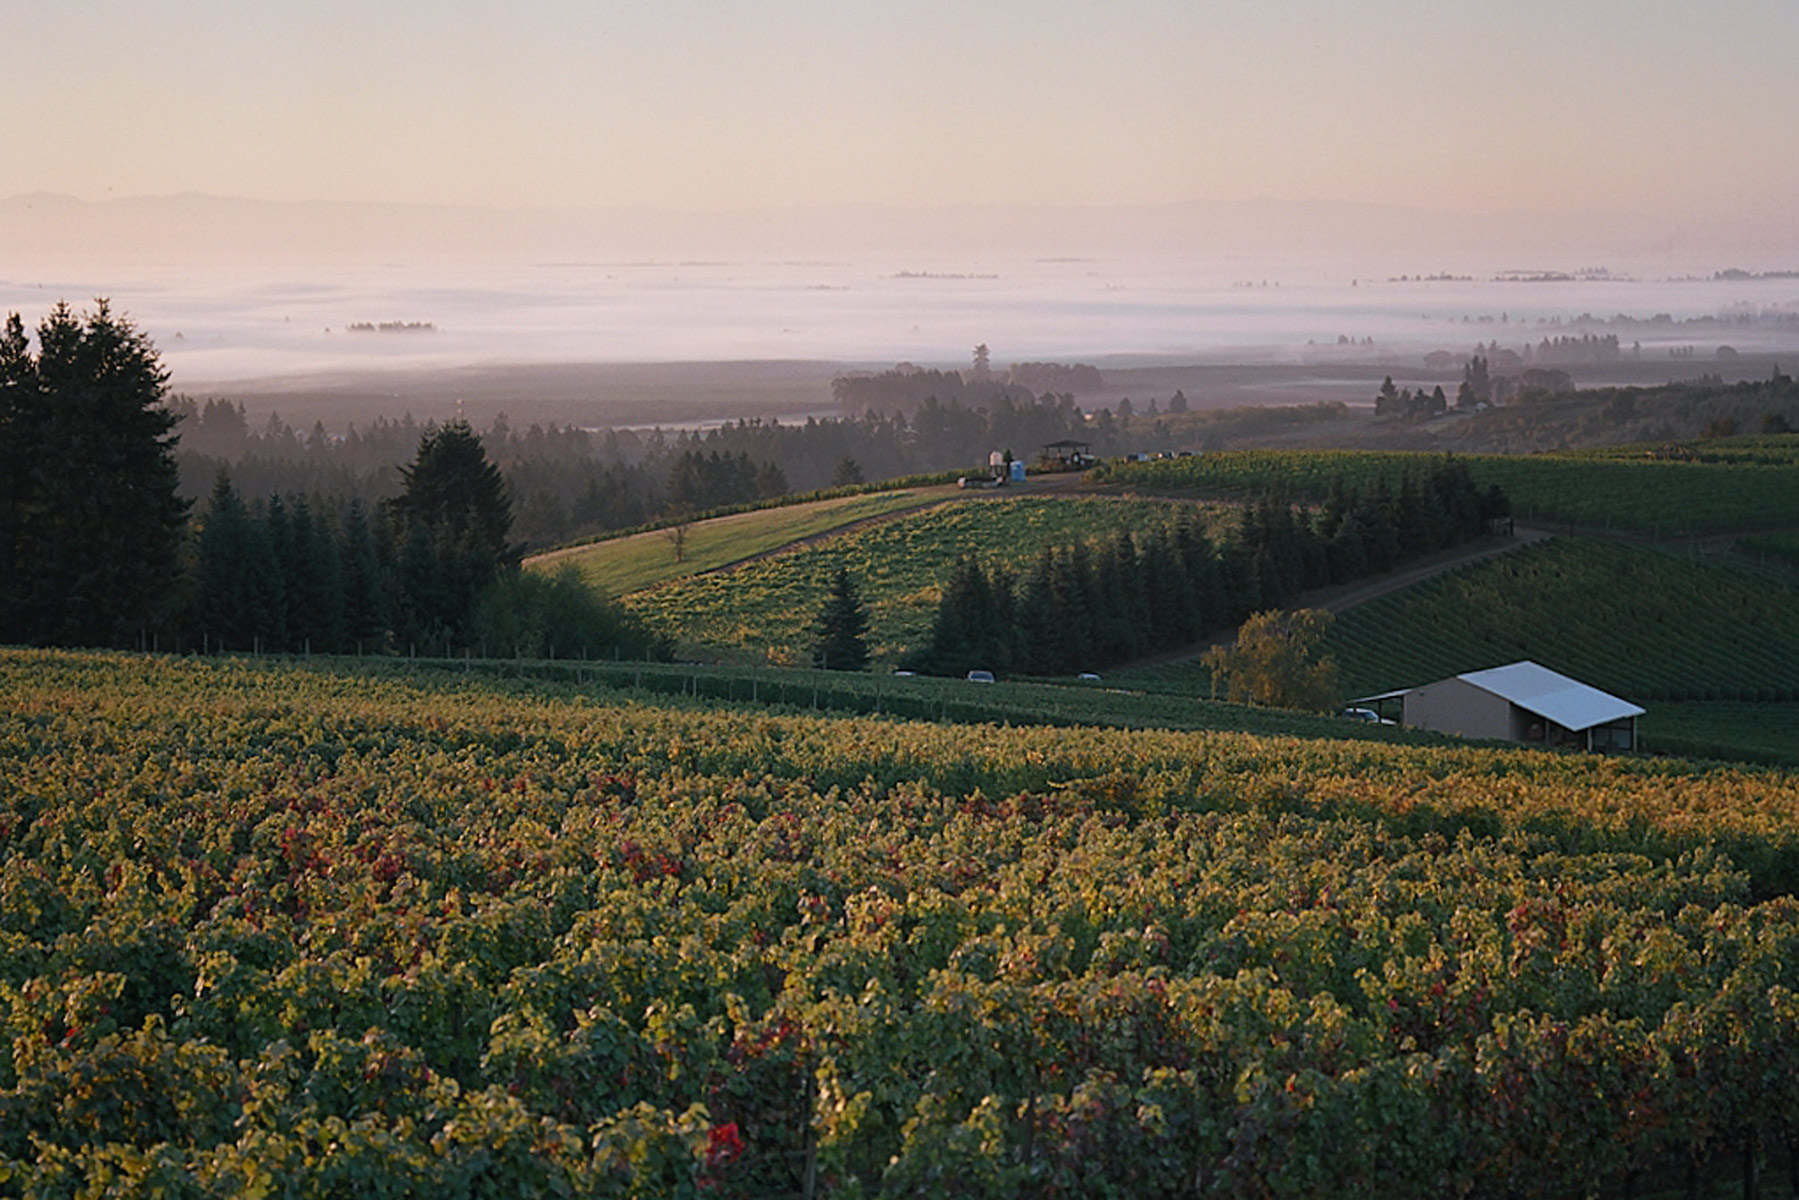 Willamette-Winderlea-Vineyard 2.jpg